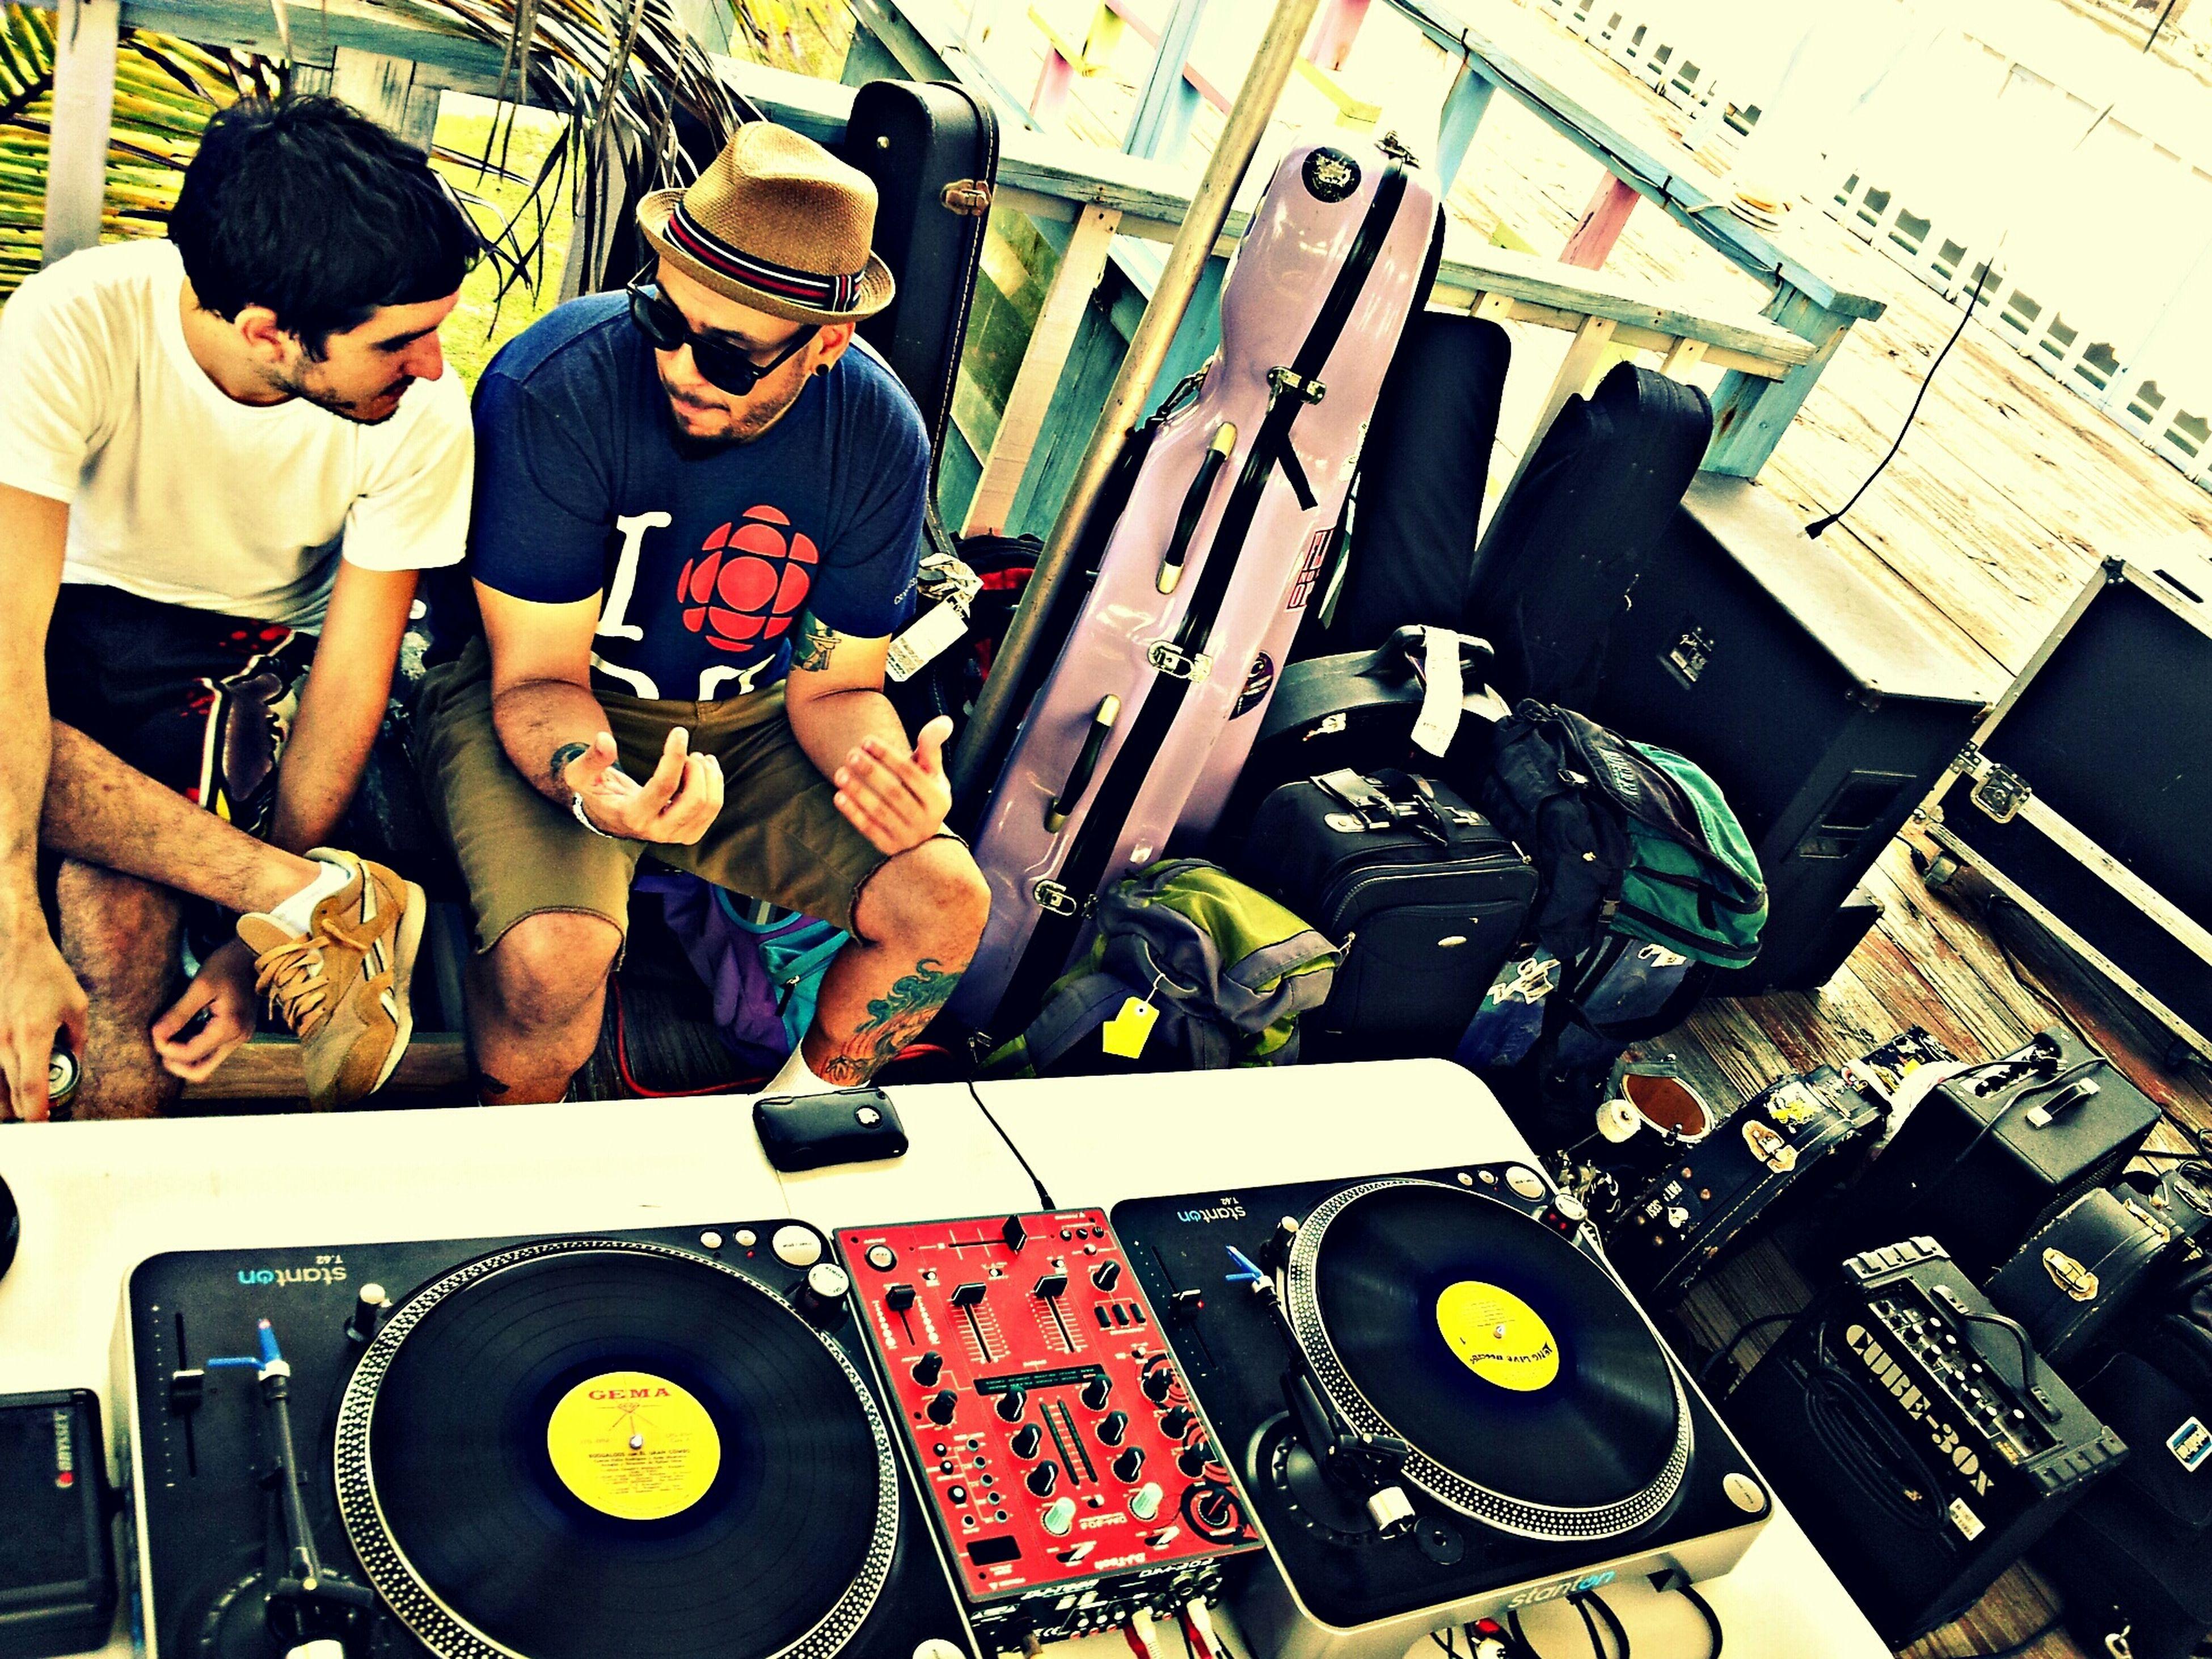 Javi y Chopz. Los Buenos Muchachos Friends People Faces Of EyeEm Puerto Rico Dub Ambassadors Boogaloo Pete Punk Rock Turntables